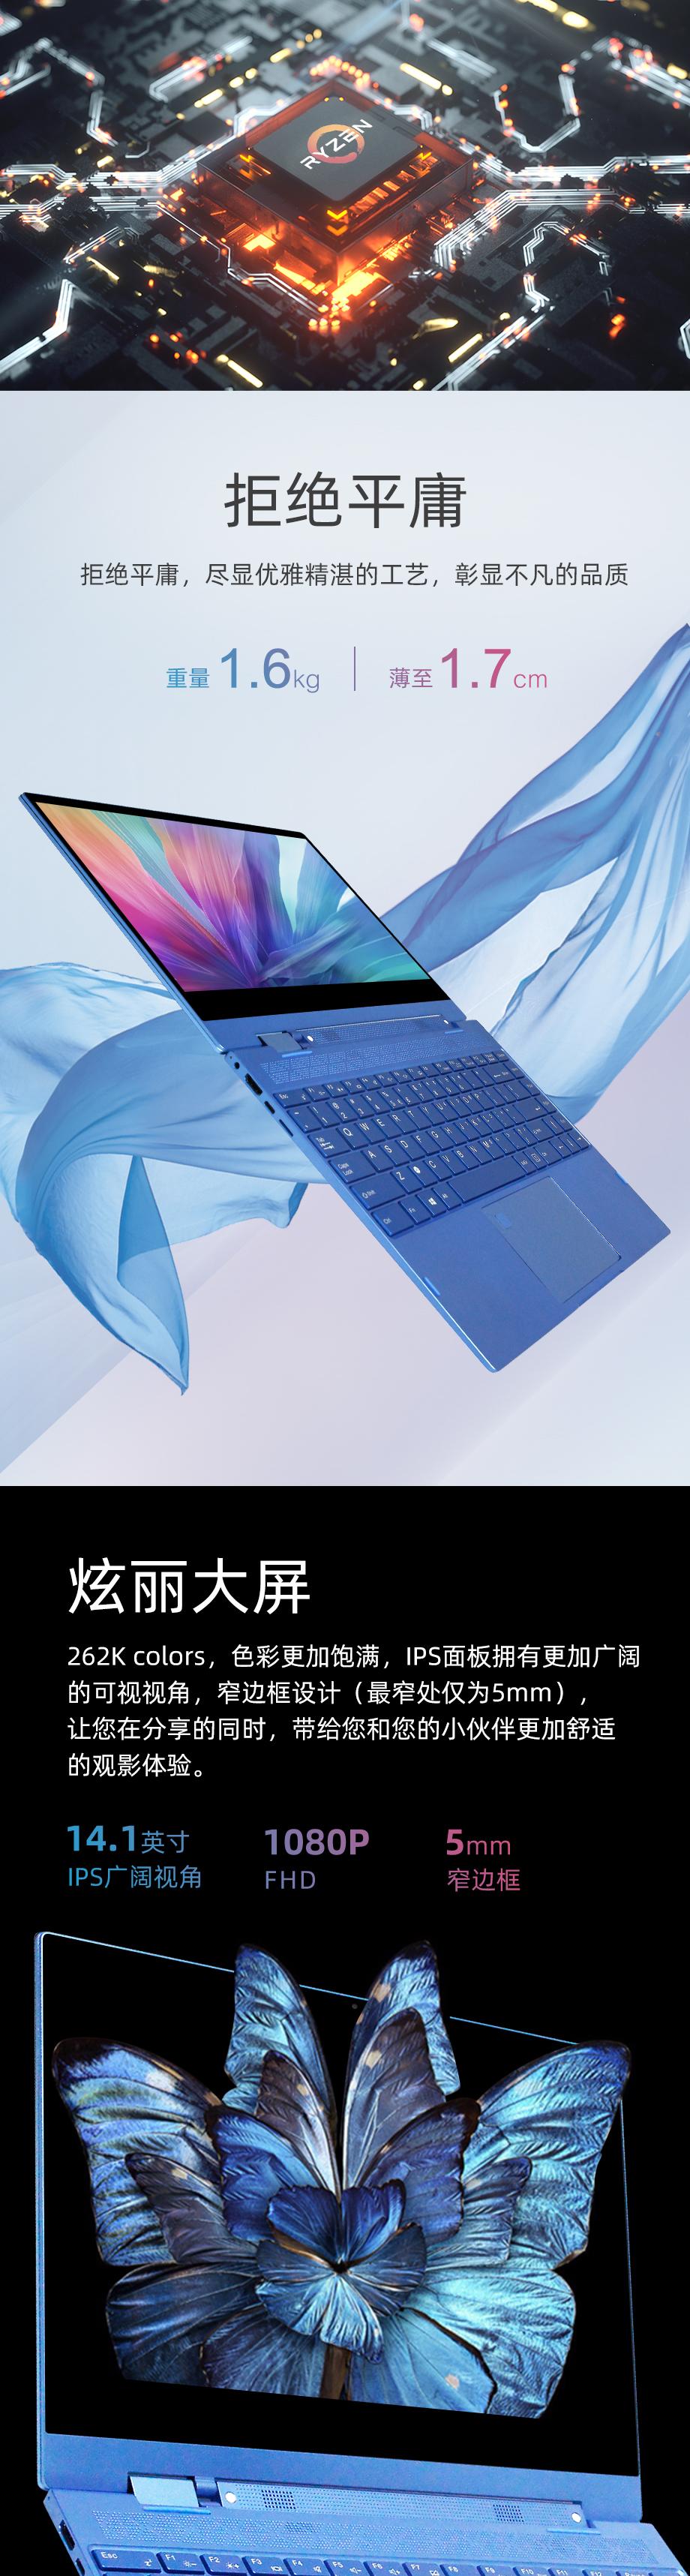 X-STATION X1笔记本电脑免费试用,评测